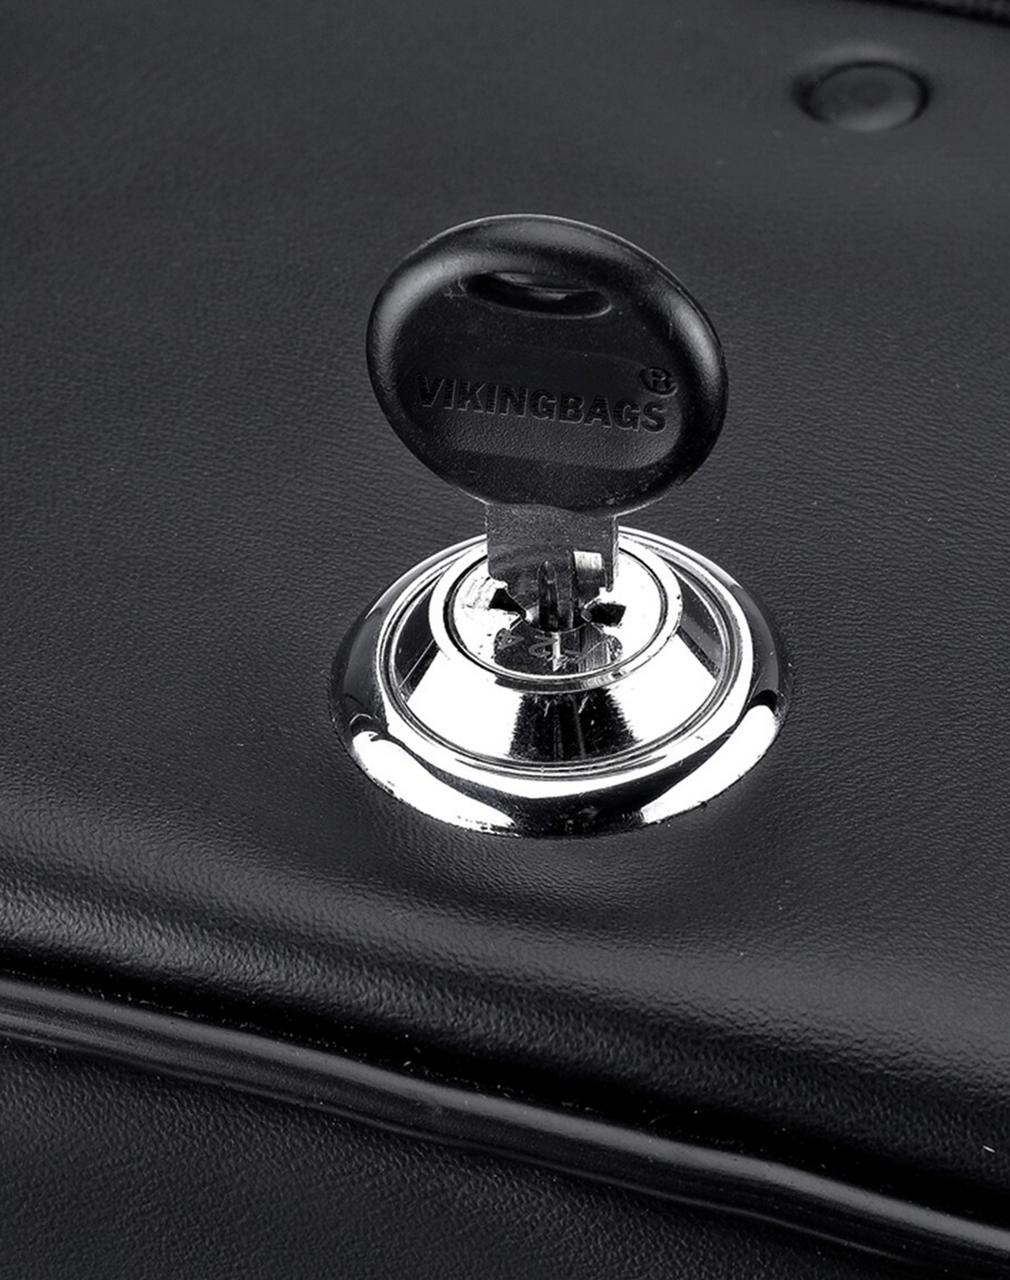 Triumph Thunderbird Single Strap Shock Cutout Slanted Large Motorcycle Saddlebags Key Lock View